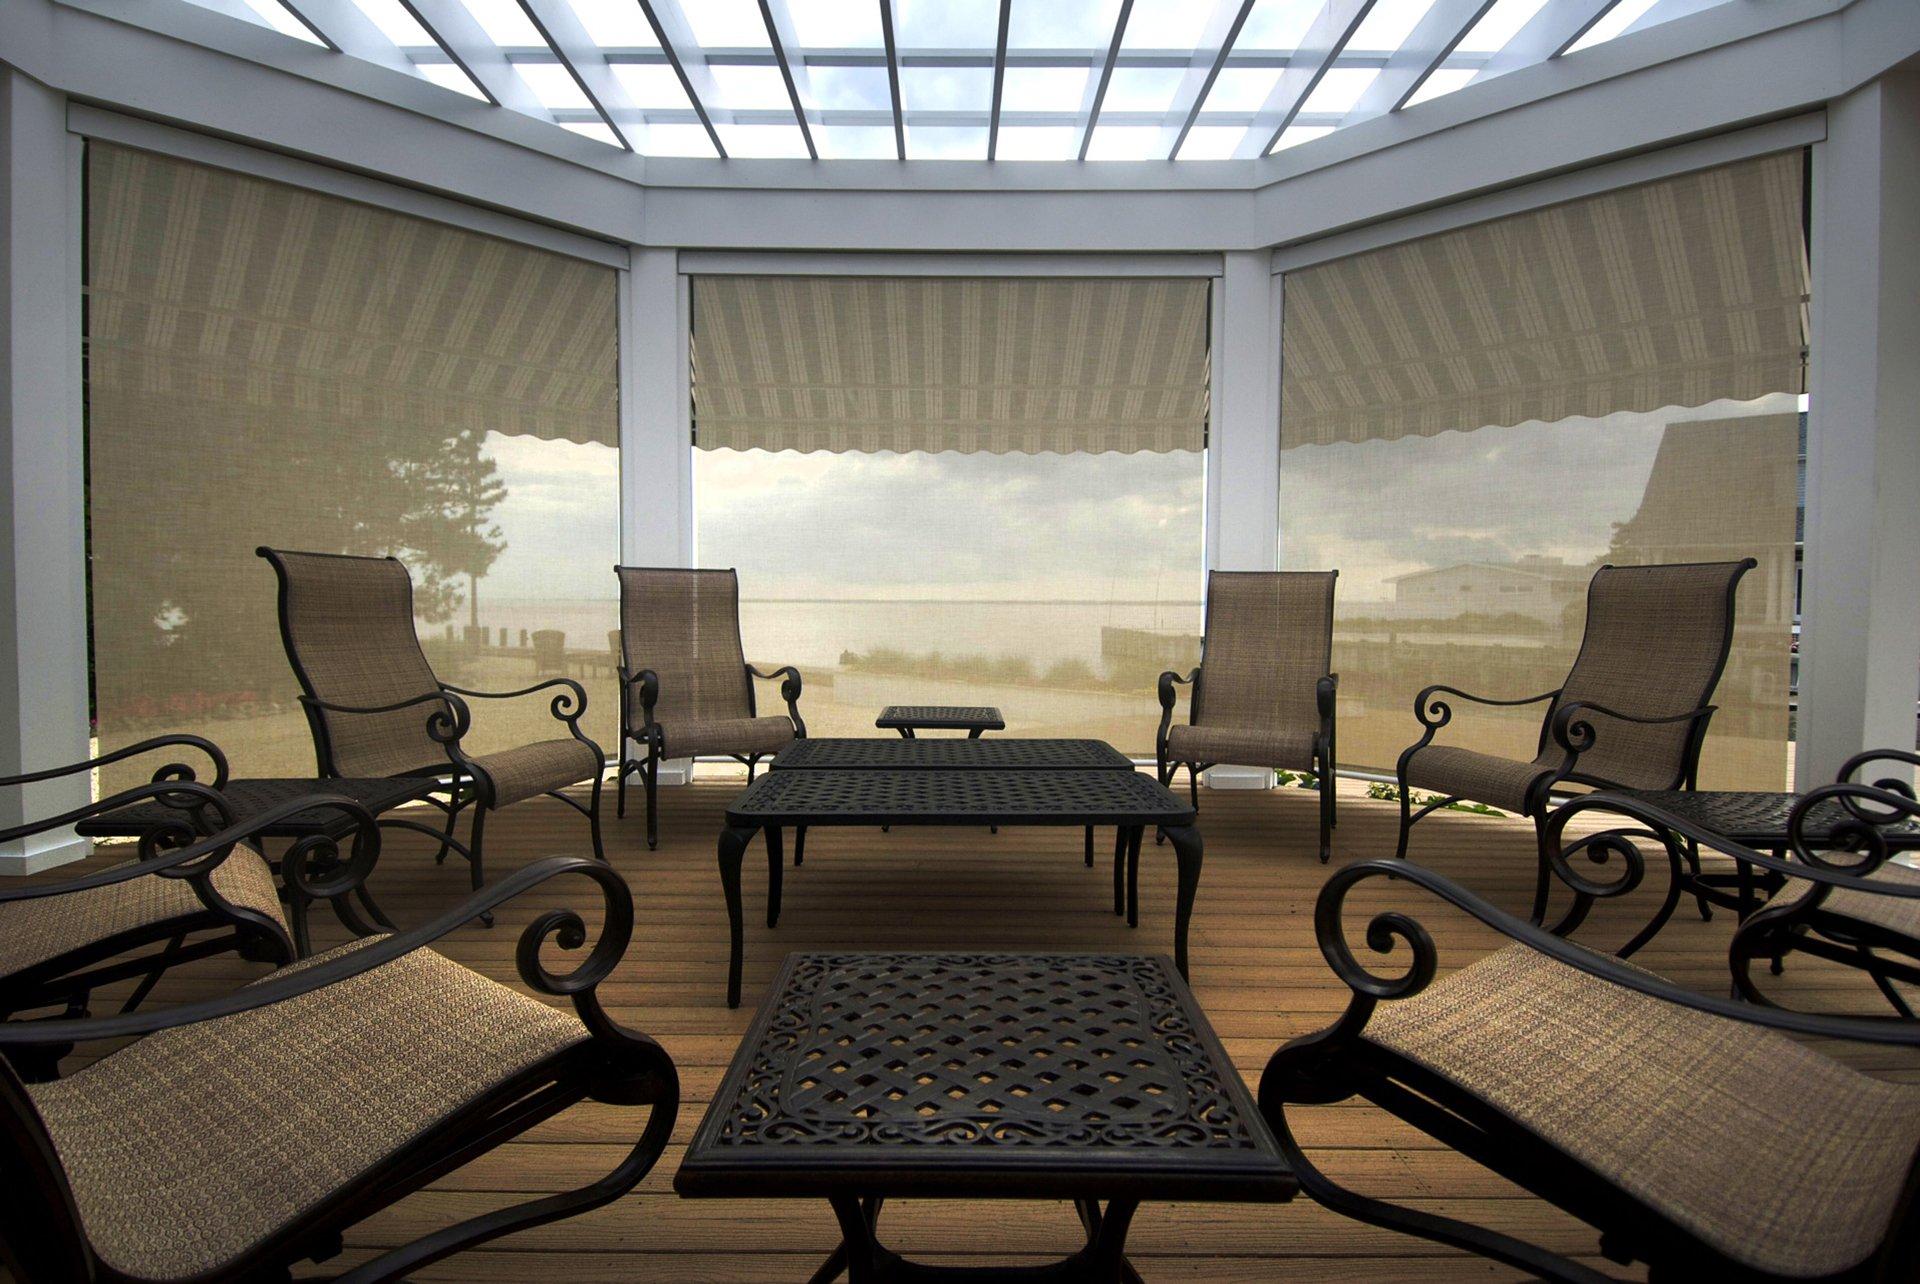 All season sunrooms erie pa basement remodeling for Bella retractable screen door